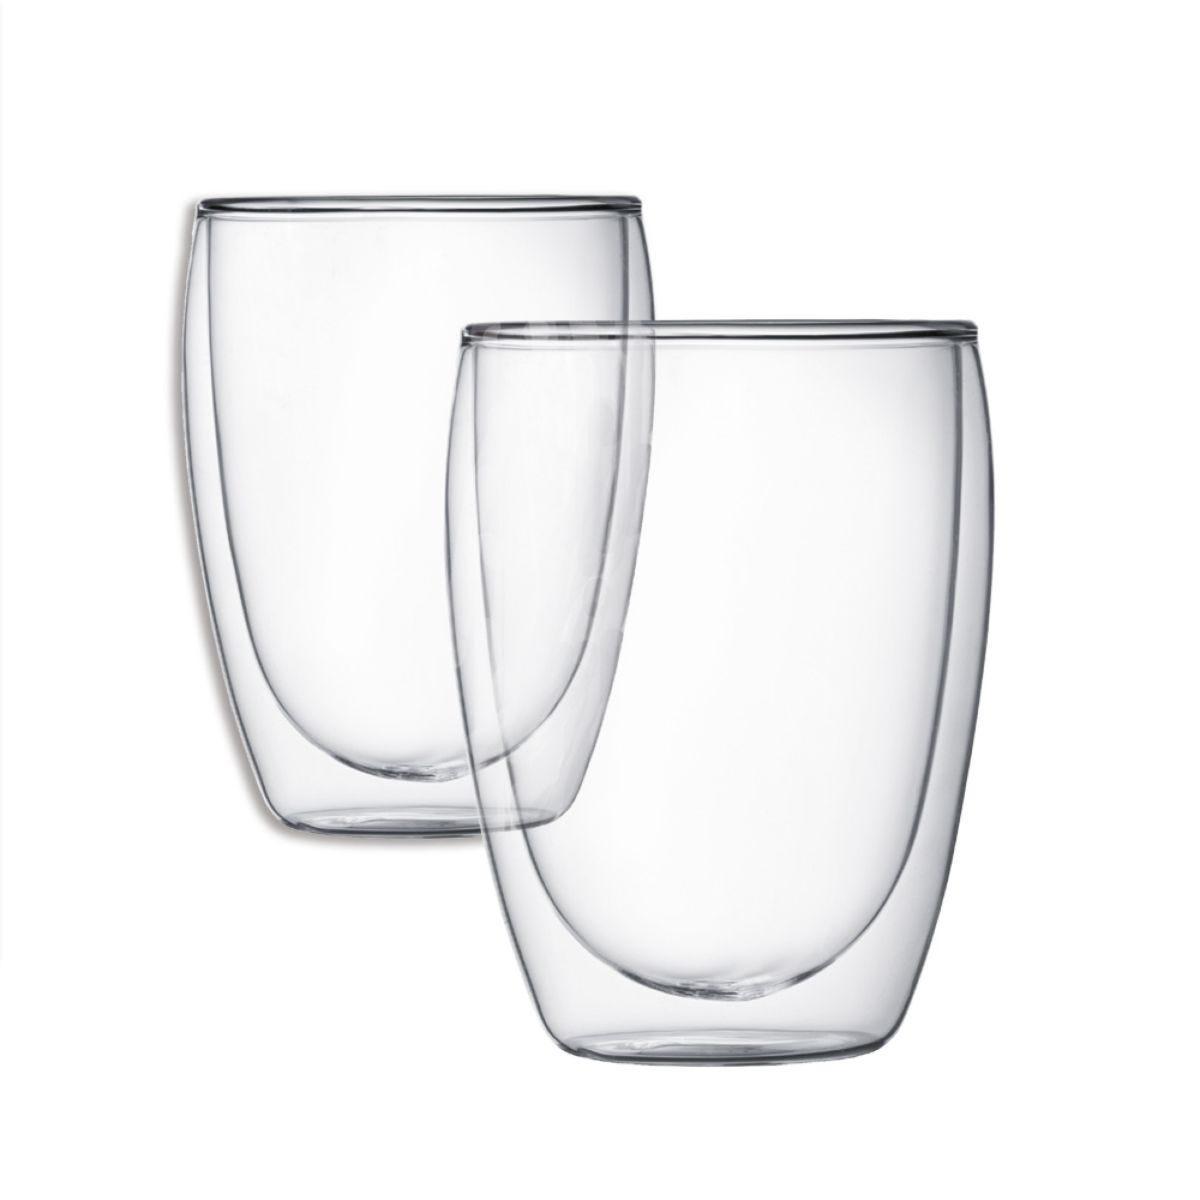 Bodum Double-Walled Pavina Glass Mug - Pair